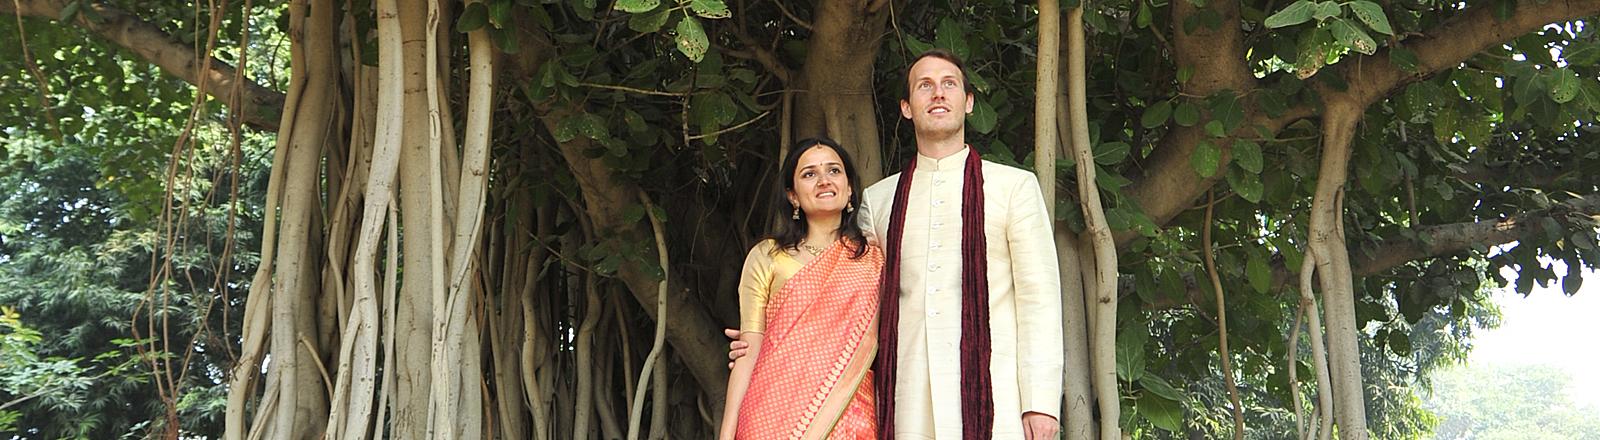 Saskya Jain (links) und Christopher Kloeble